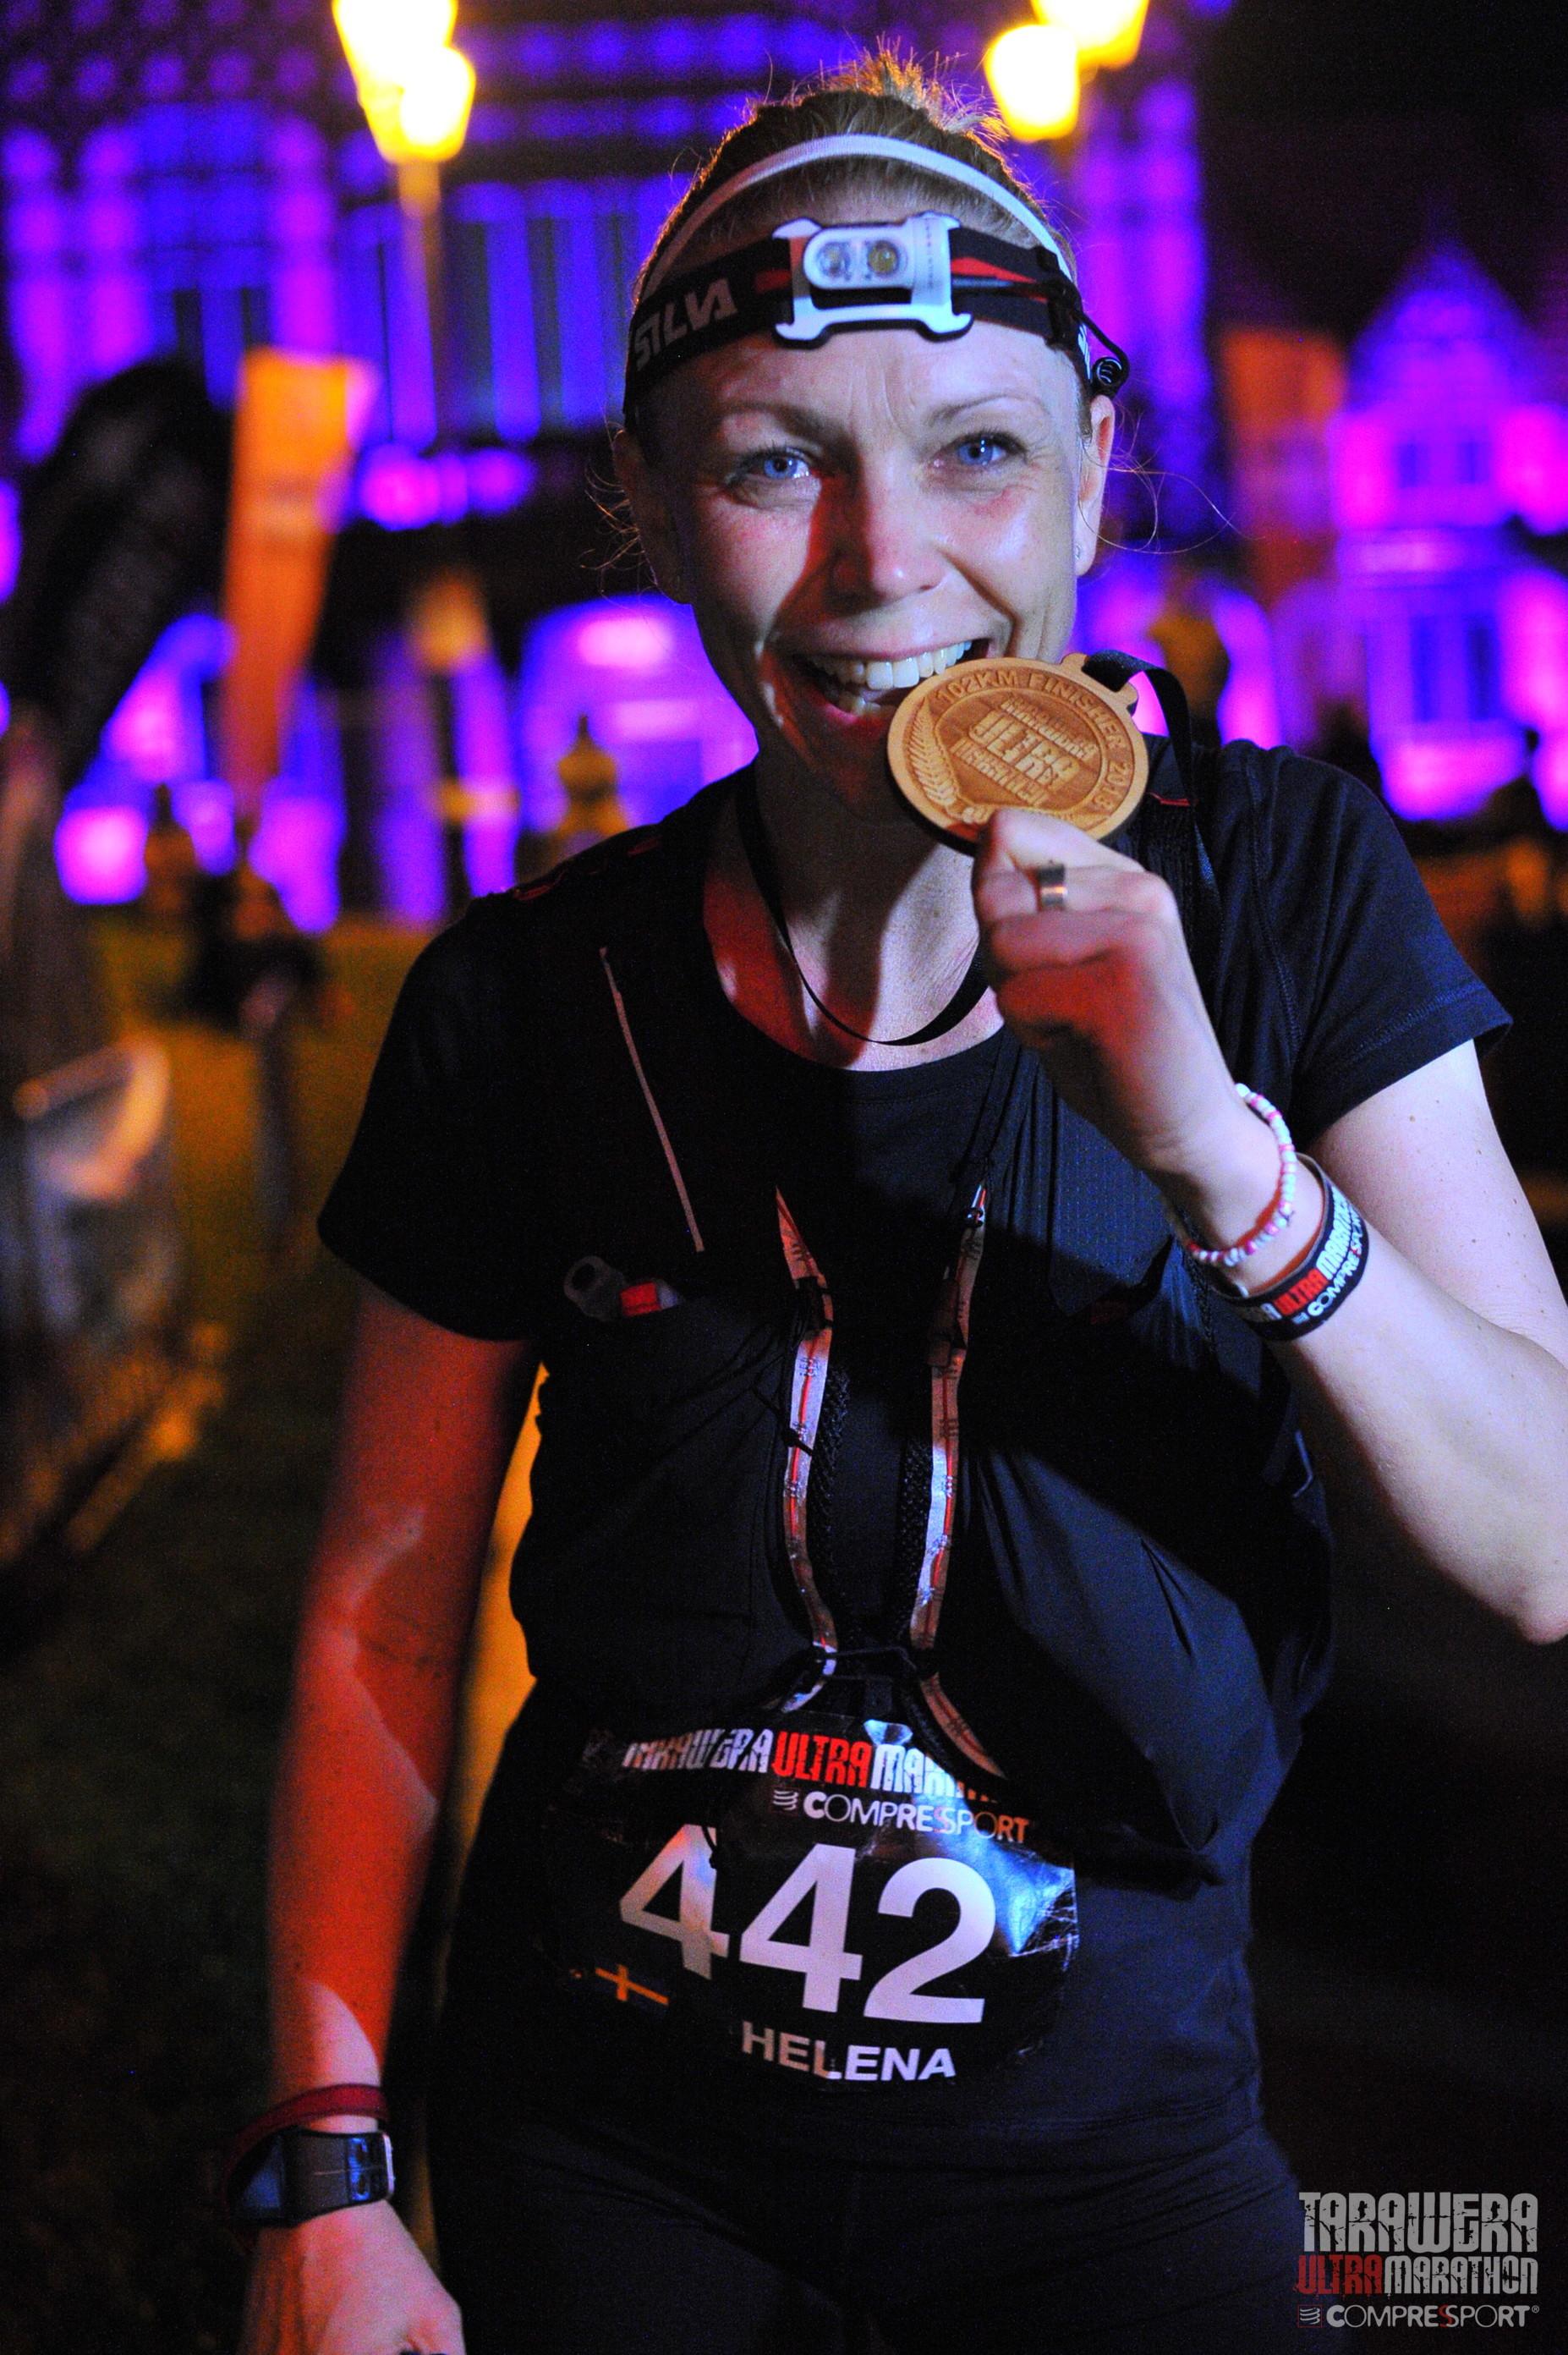 Tarawera Ultramarathon finisher